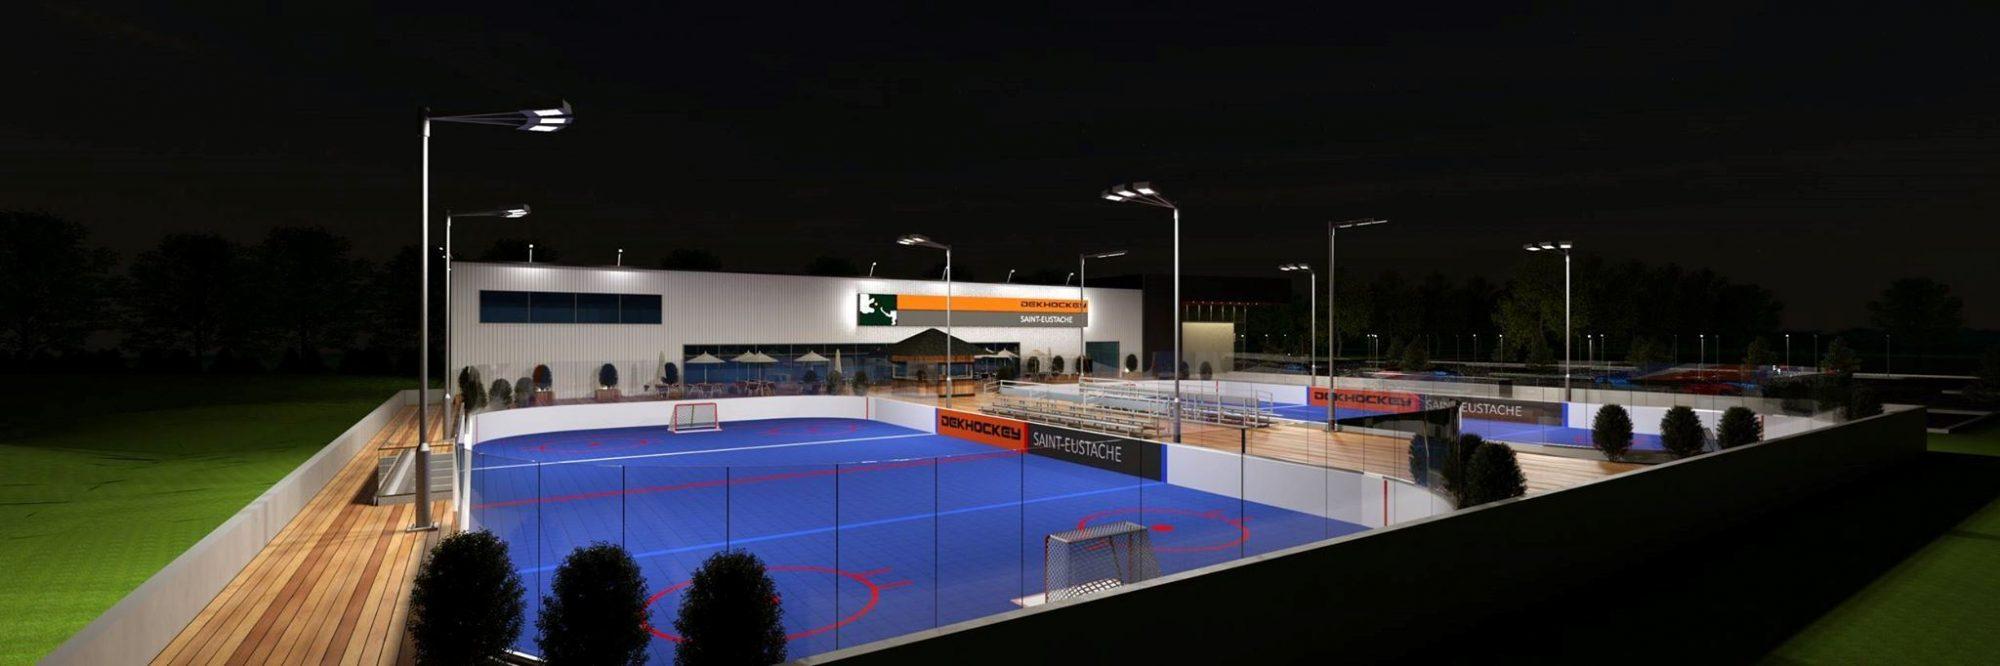 DekHockey St Eustache Front